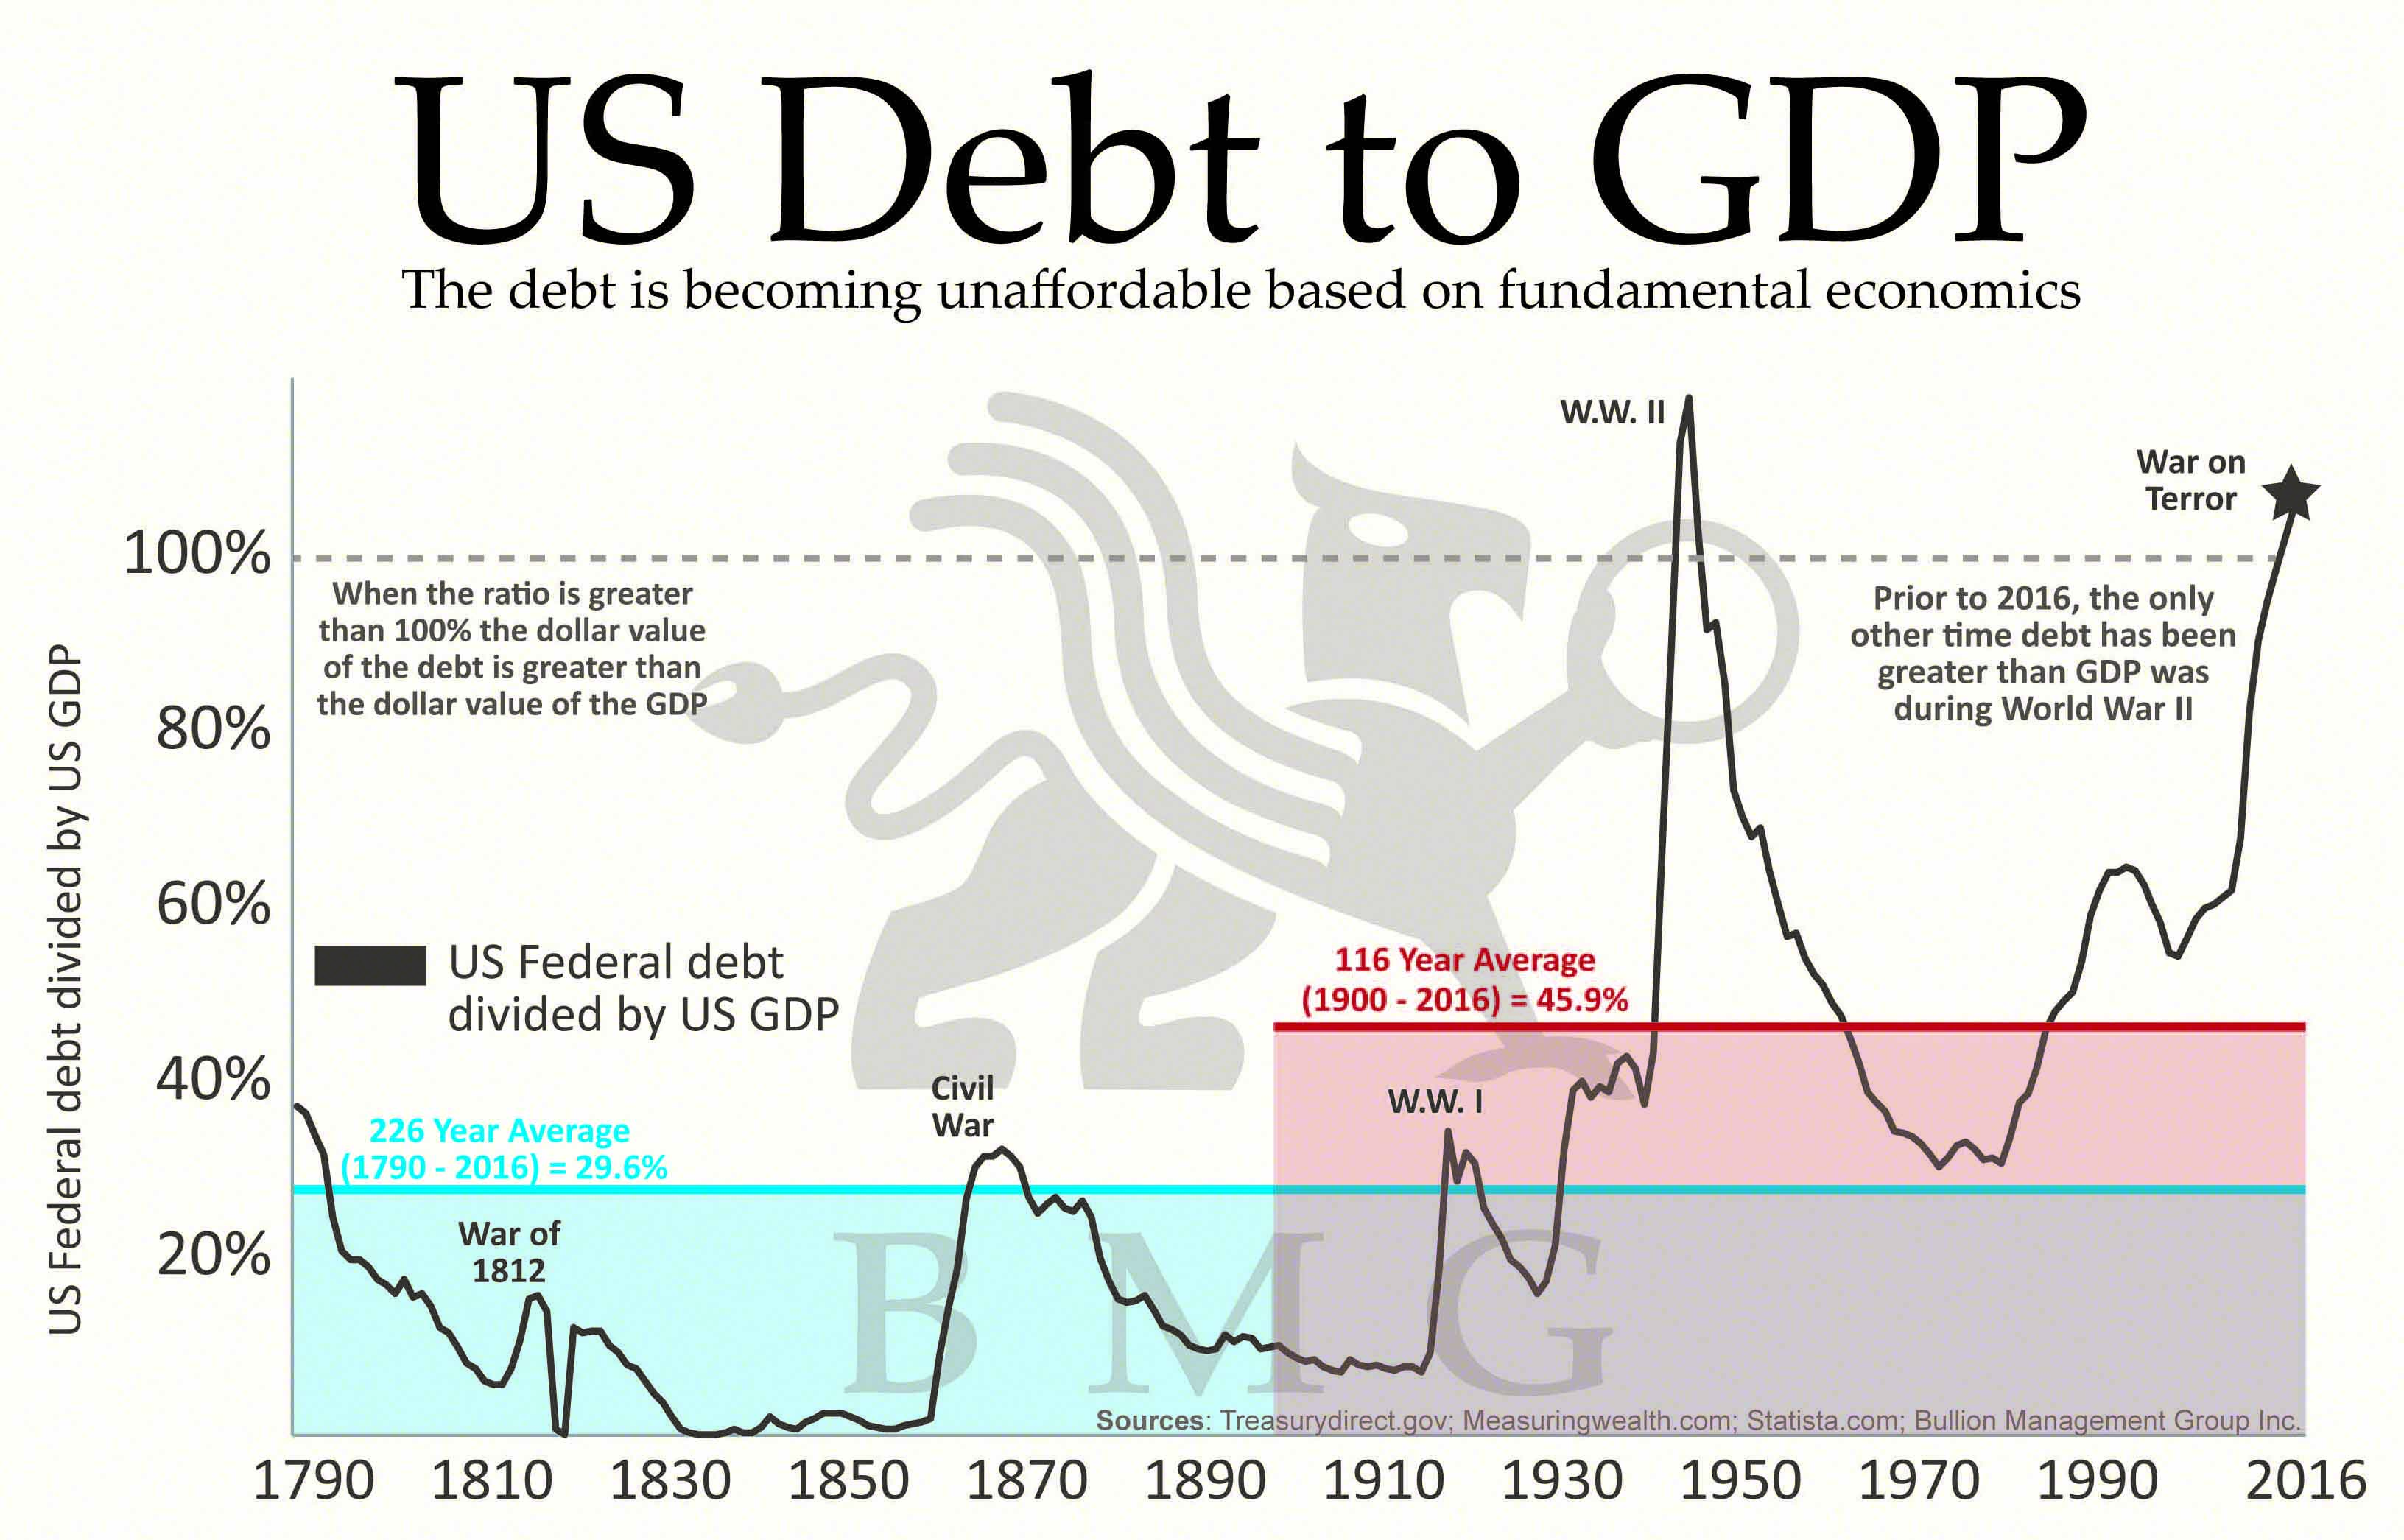 debt-to-gdp-1790-2016-14.09.2016.jpg